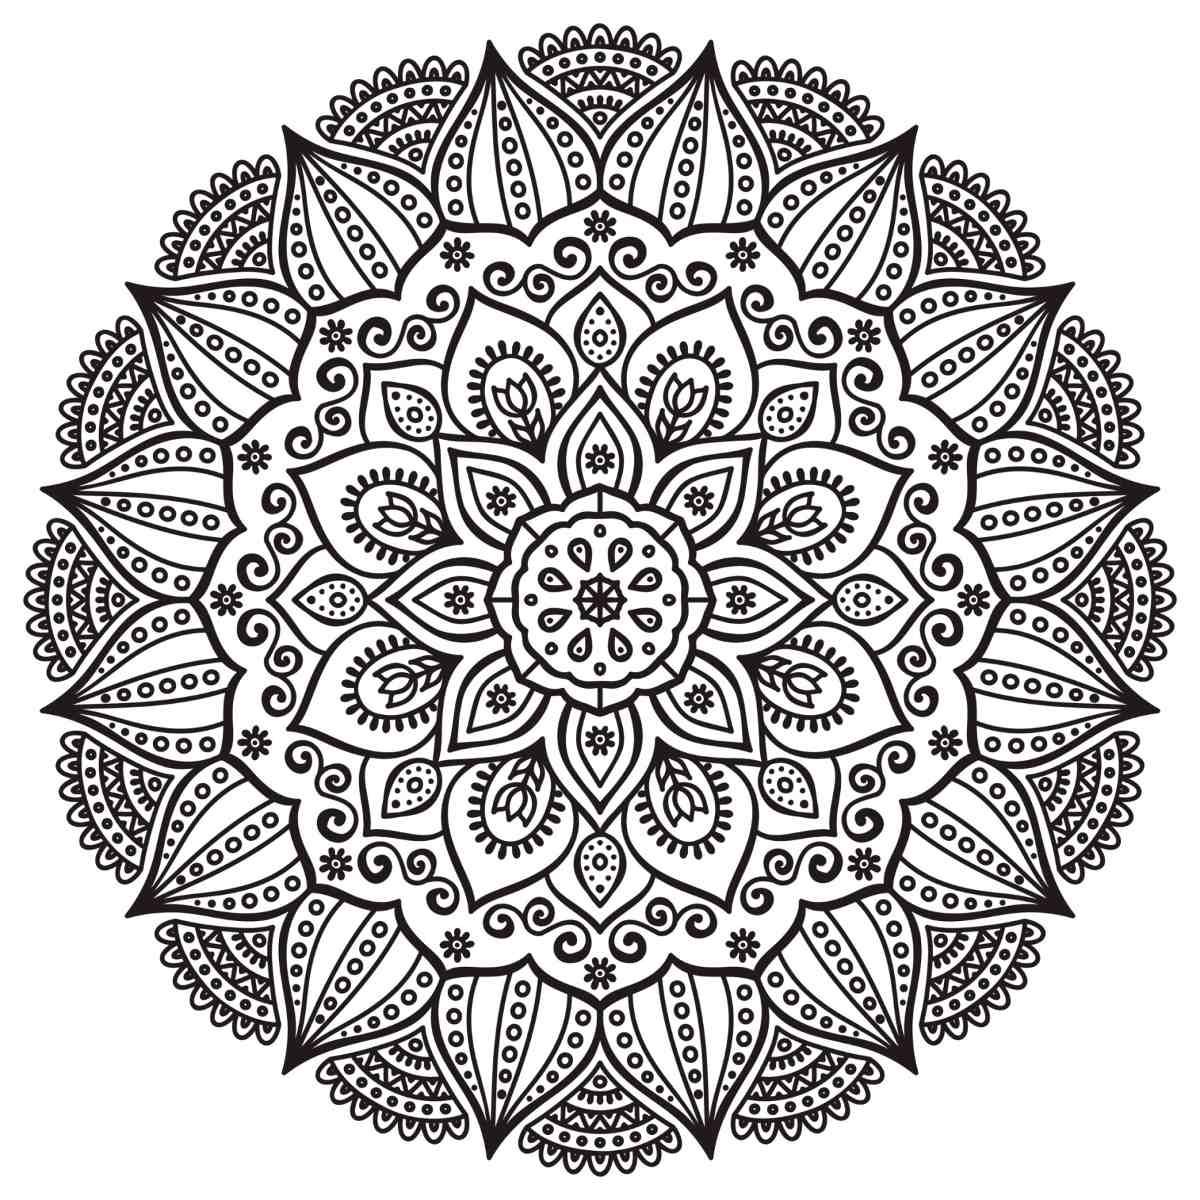 200 Mandalas Para Colorear Imprimibles Libro Digital (pdf) - Bs. 0 ...